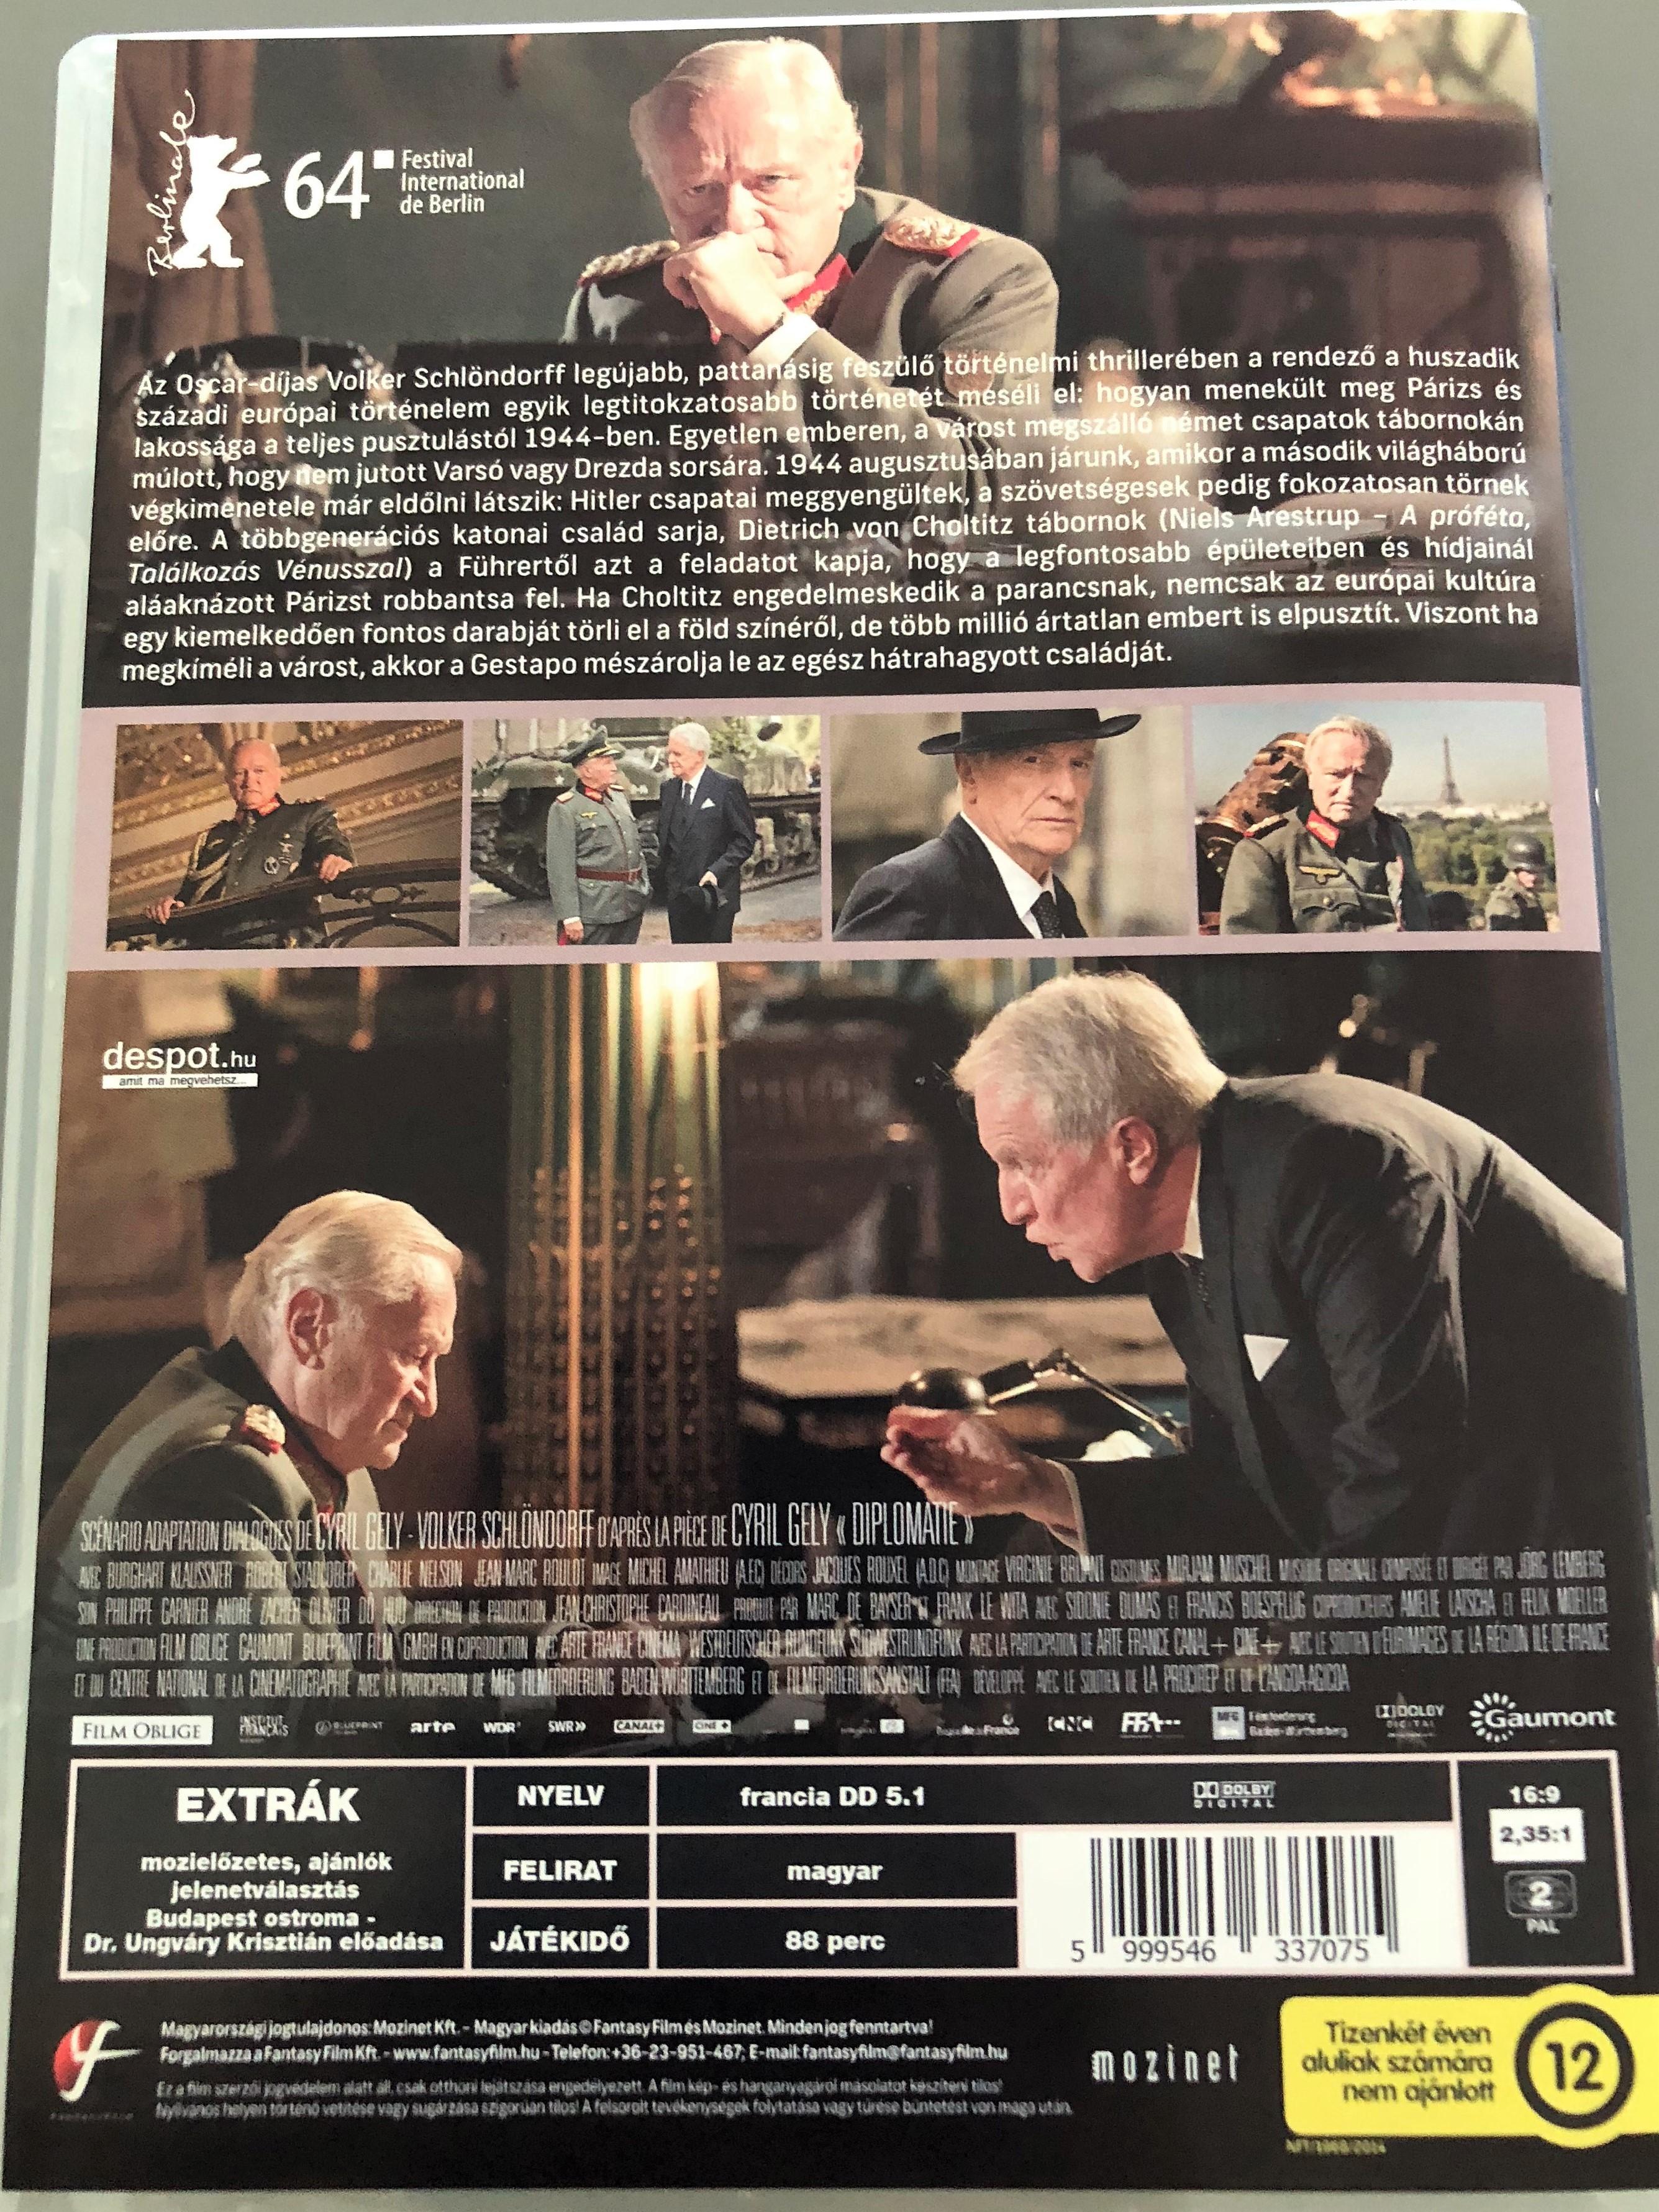 diplomatie-dvd-2014-az-utols-jszaka-p-rizsban-diplomacy-directed-by-volker-schl-ndorff-starring-andr-dussollier-niels-arestrup-based-on-cyril-gely-s-diplomatie-historical-drama-film-2-.jpg